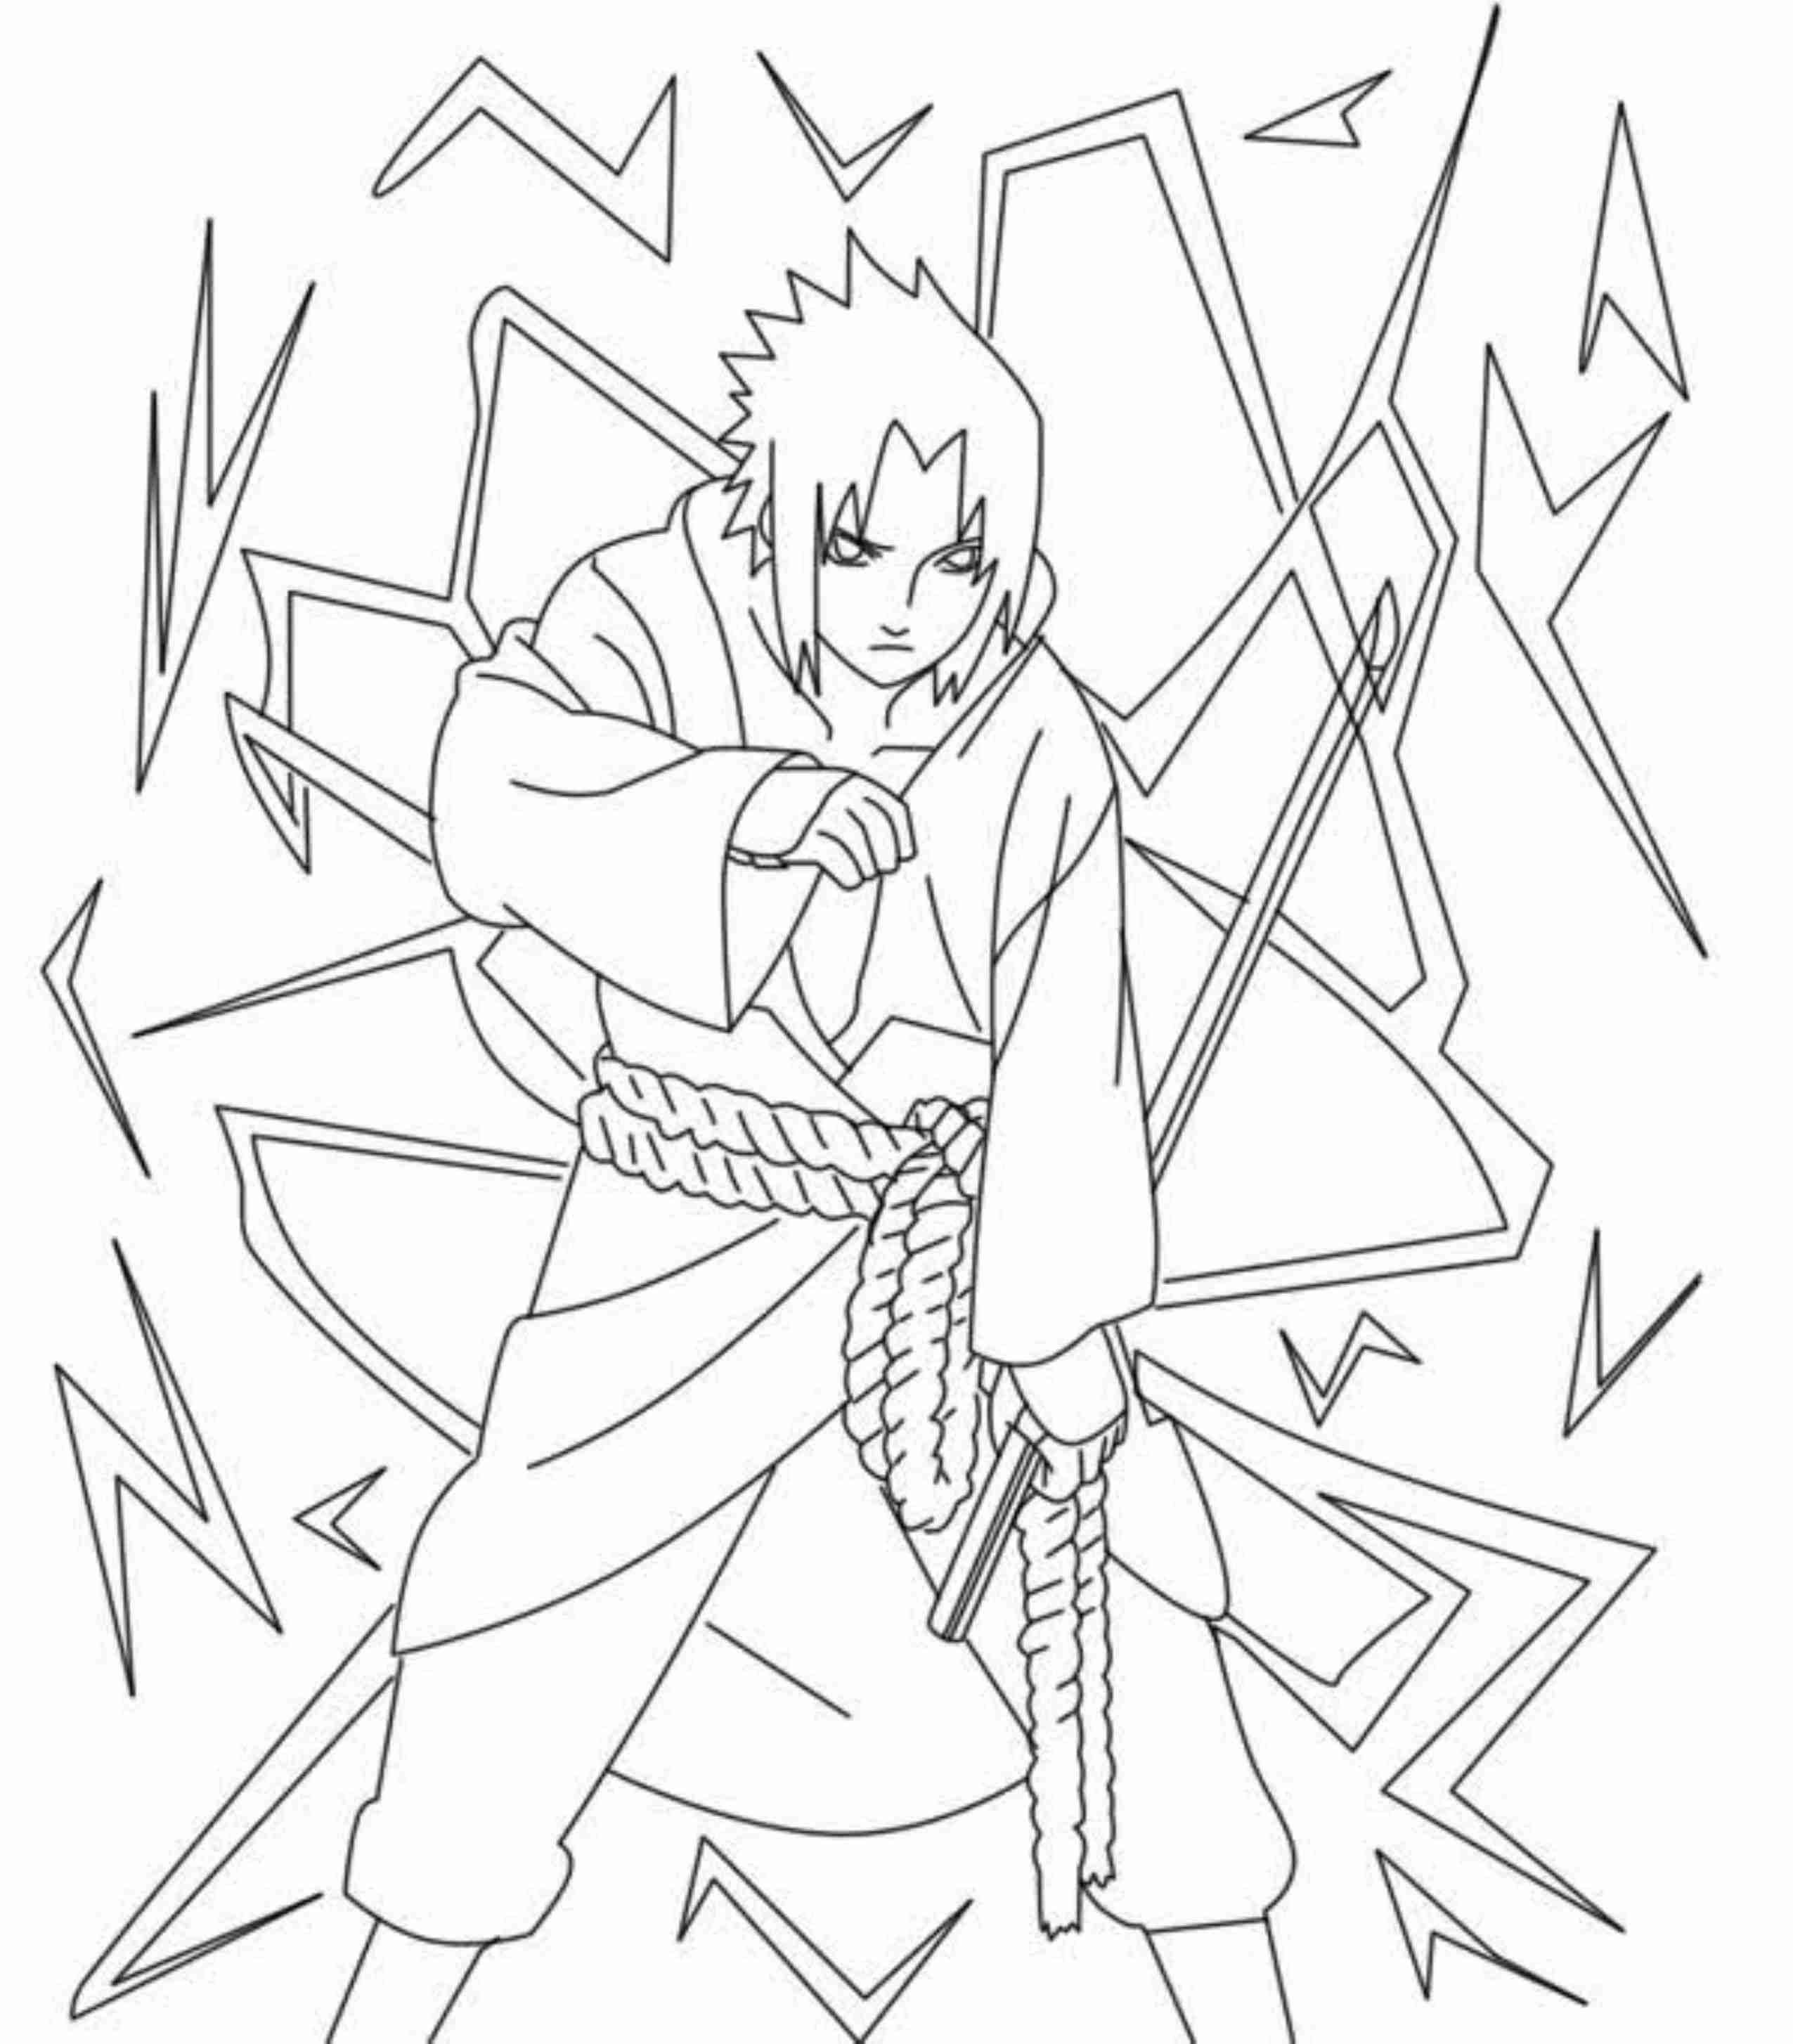 naruto-sasuke-akatsuki-coloring-book-pages   BestAppsForKids.com